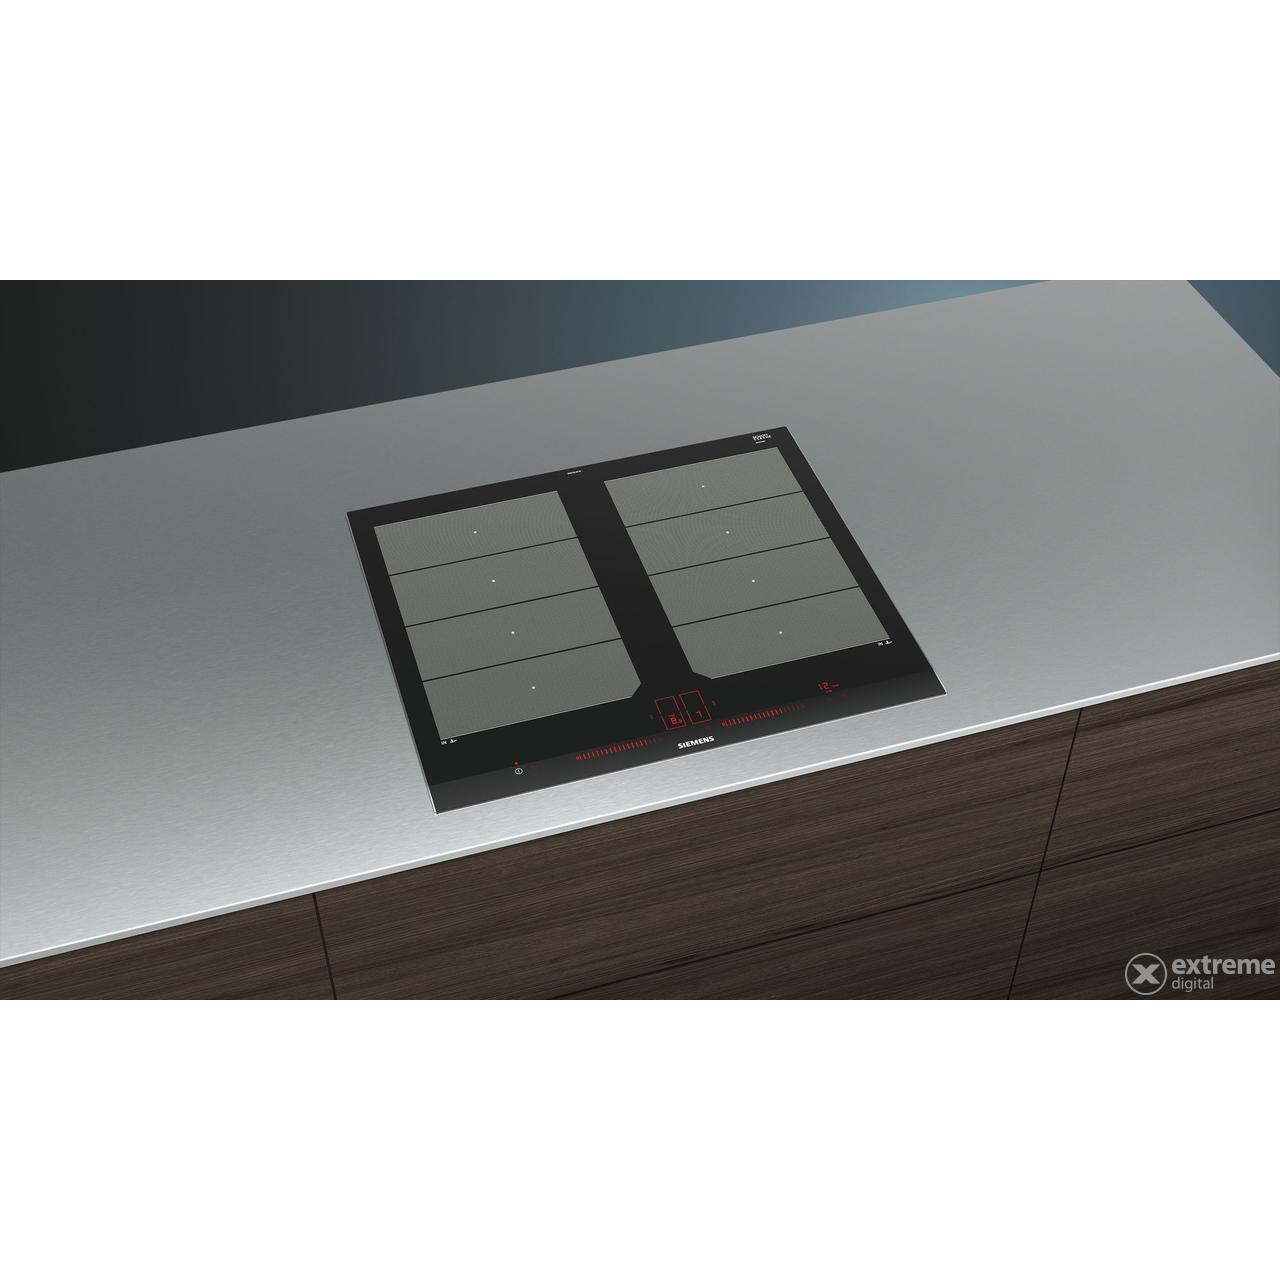 siemens ex675lxc1e be p thet indukci d vegker mia. Black Bedroom Furniture Sets. Home Design Ideas